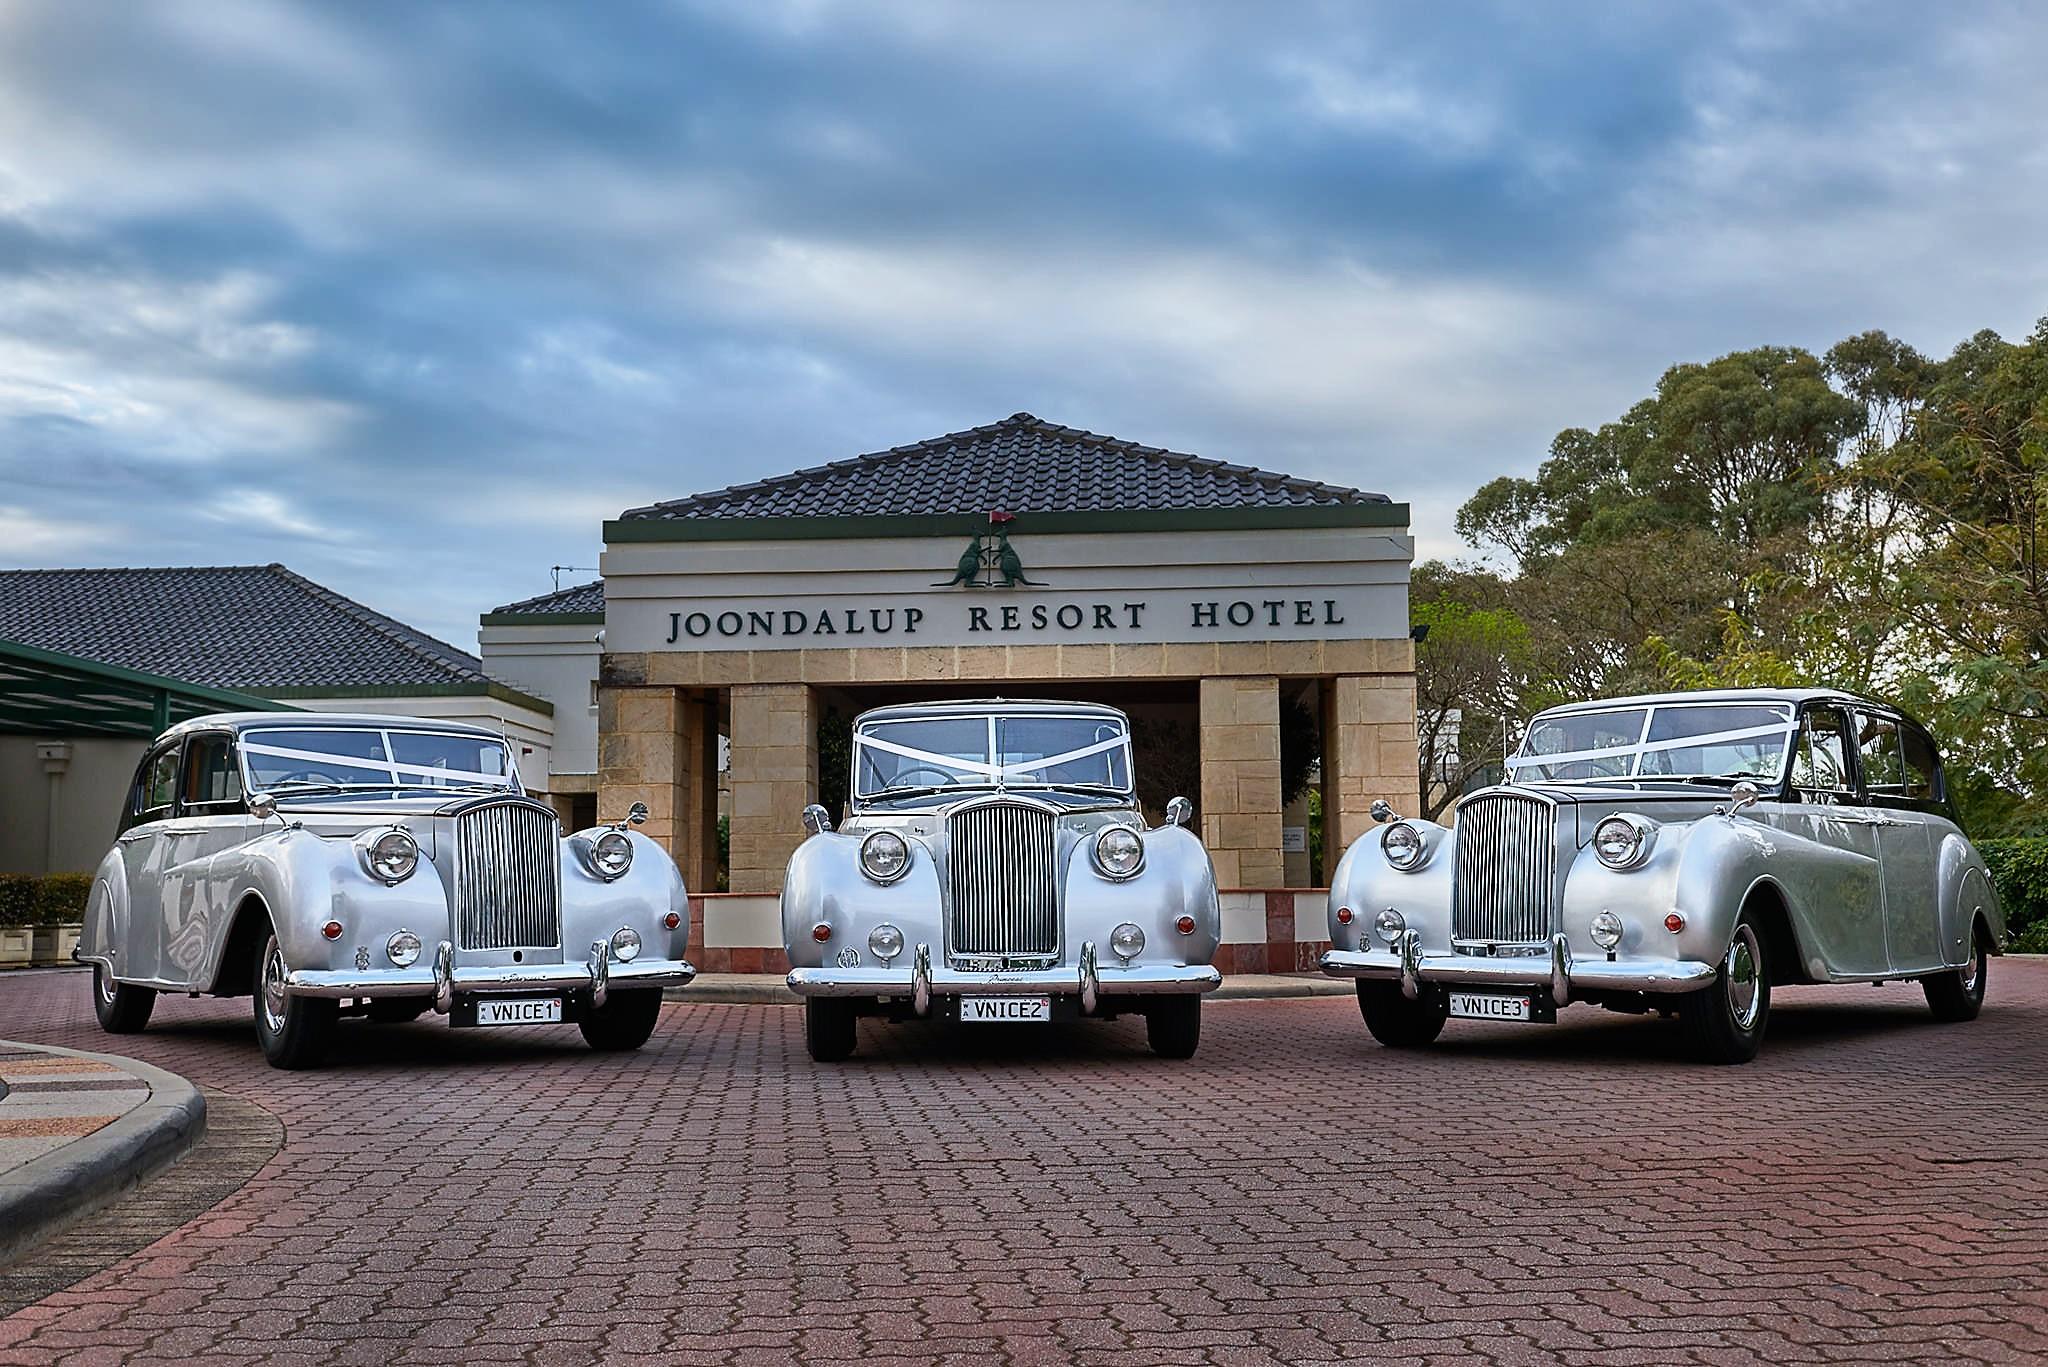 9-Very_Nice_Classics_Joondalup_Resort_Bruno_Kongawoin_Lightbent_Images_Photoshoot_three_wedding_cars.jpg